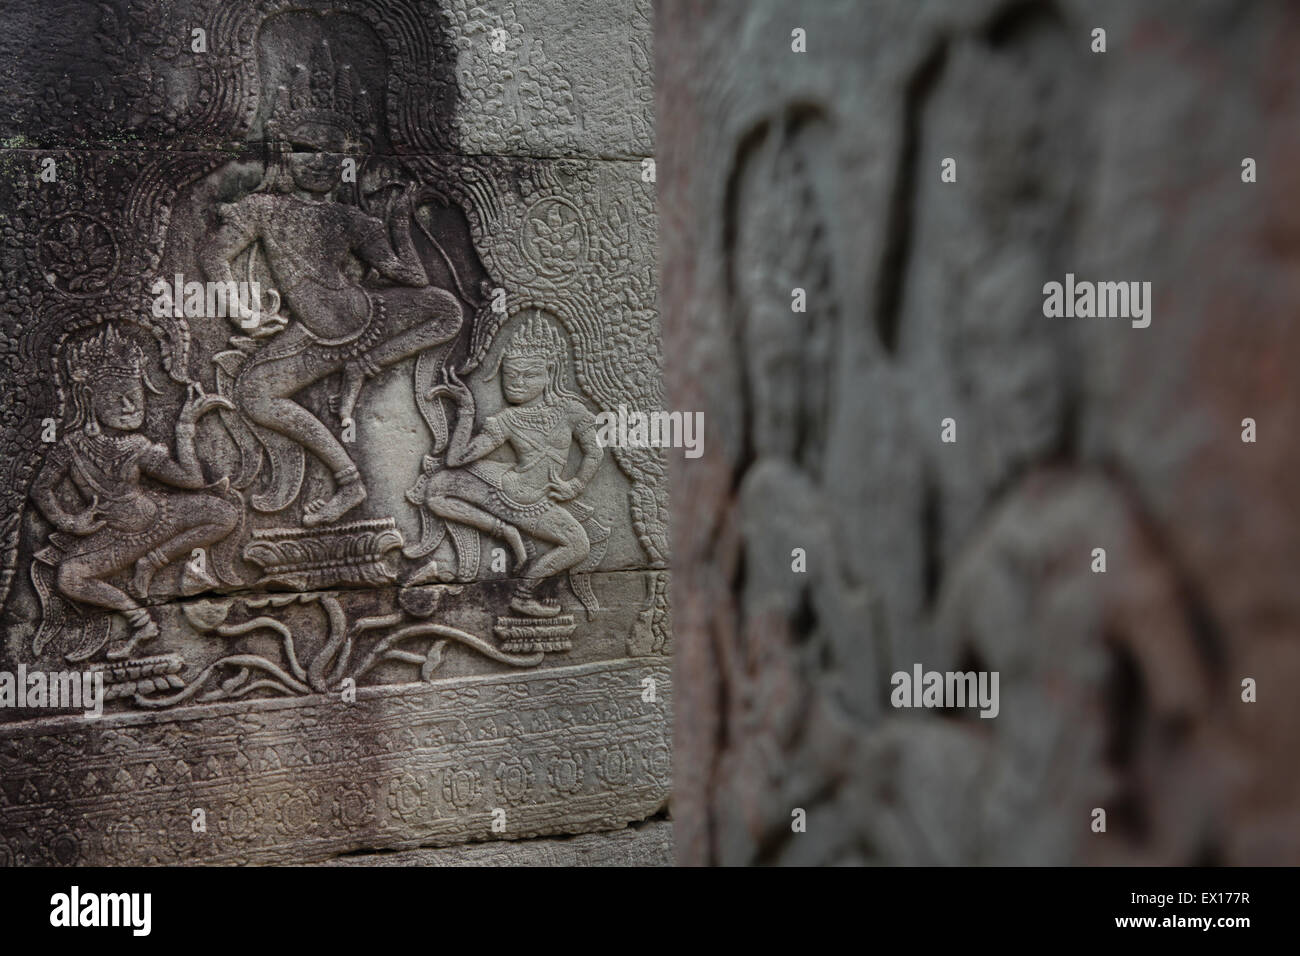 Details of Apsara reliefs at temple pillars of Prasat Bayon, Angkor Thom temple, Siem Reap, Cambodia. - Stock Image